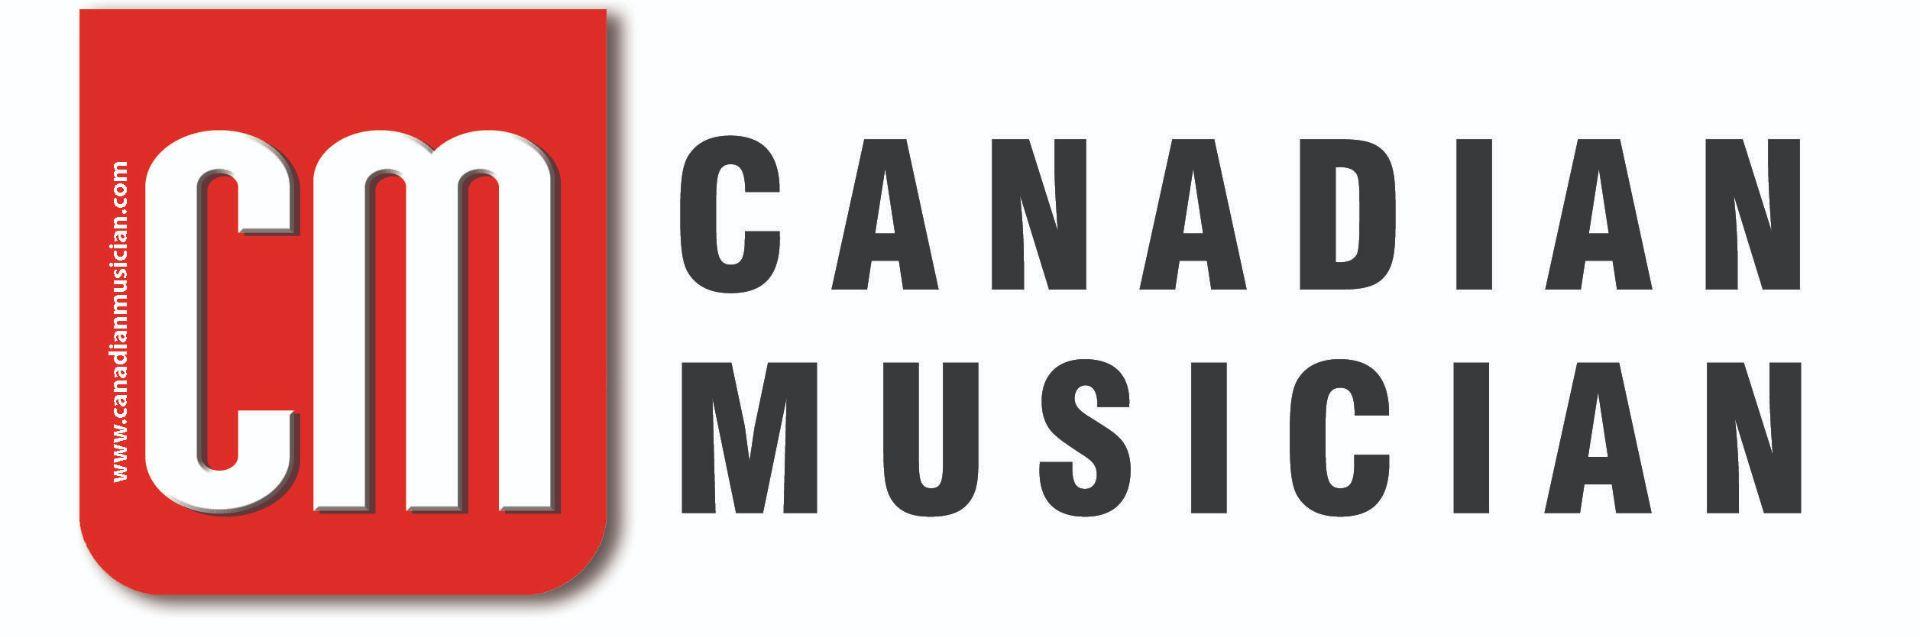 Canadian Musician.jpg